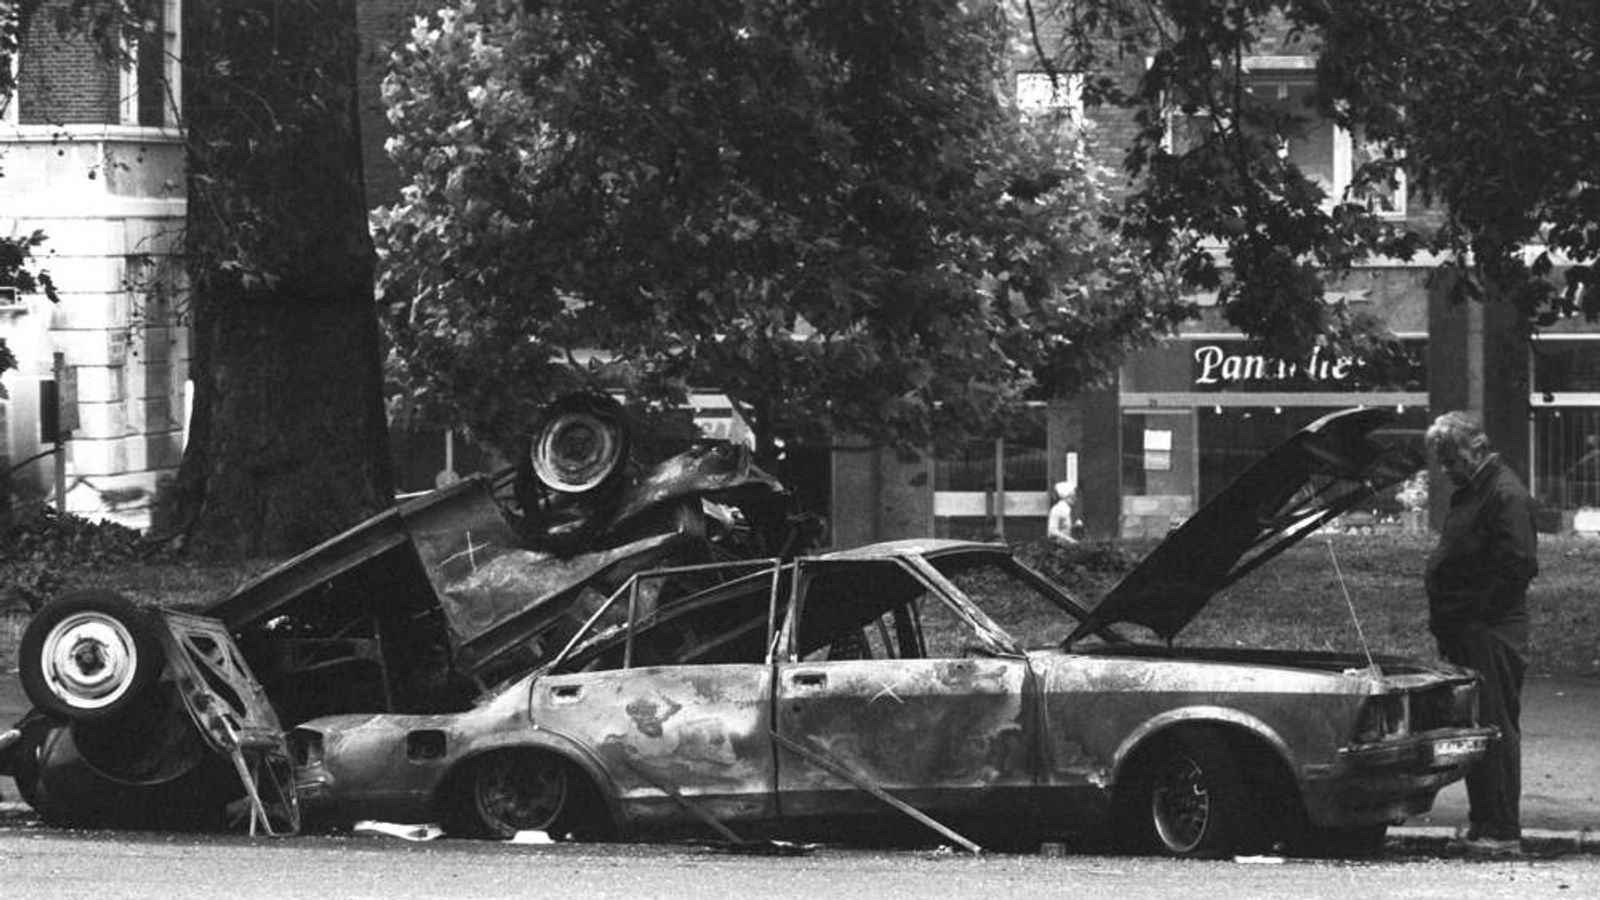 Politics - IRA Hyde Park Bombing - London